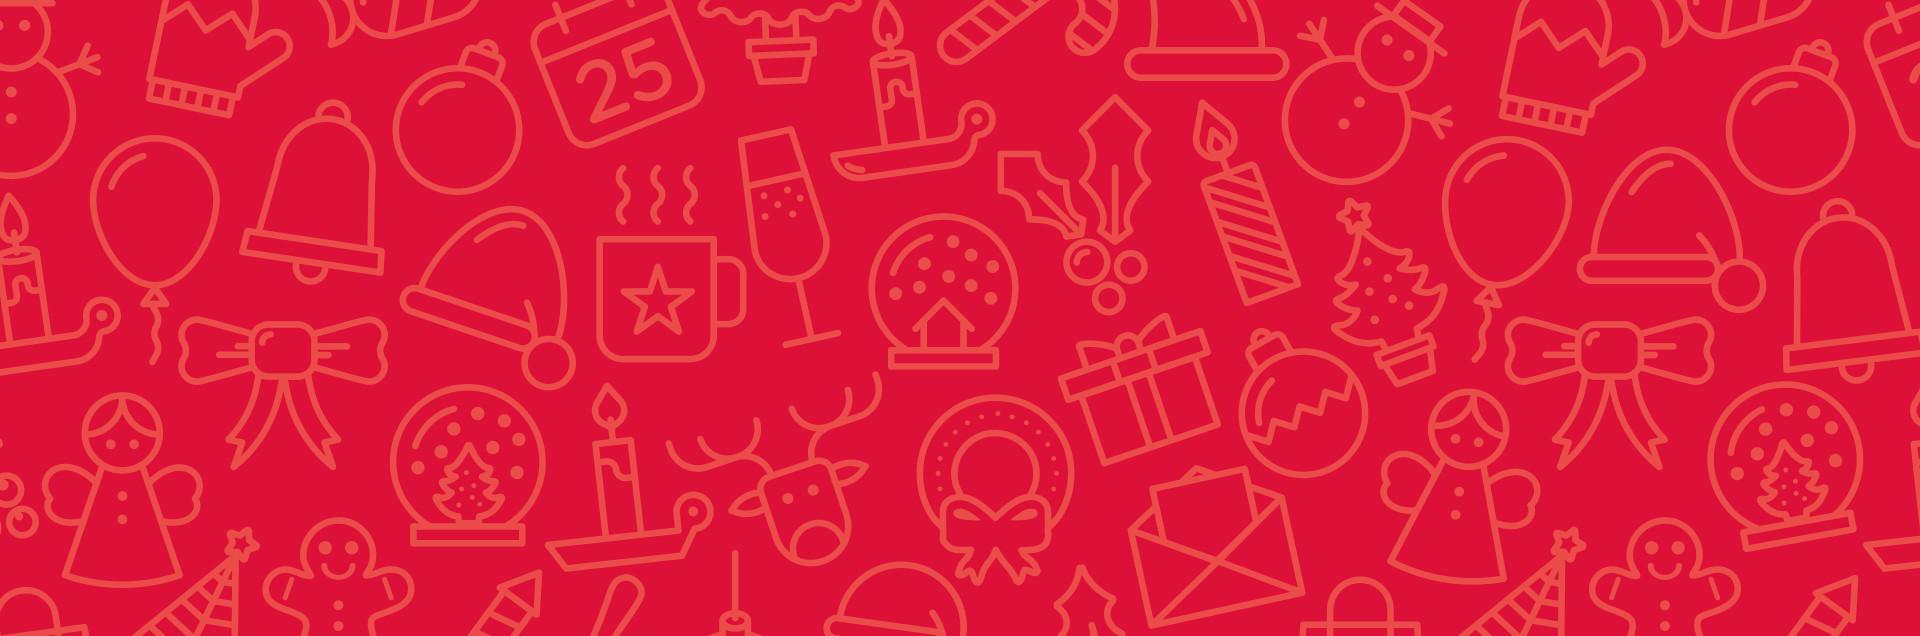 Date utili per le consegne di Natale 2017